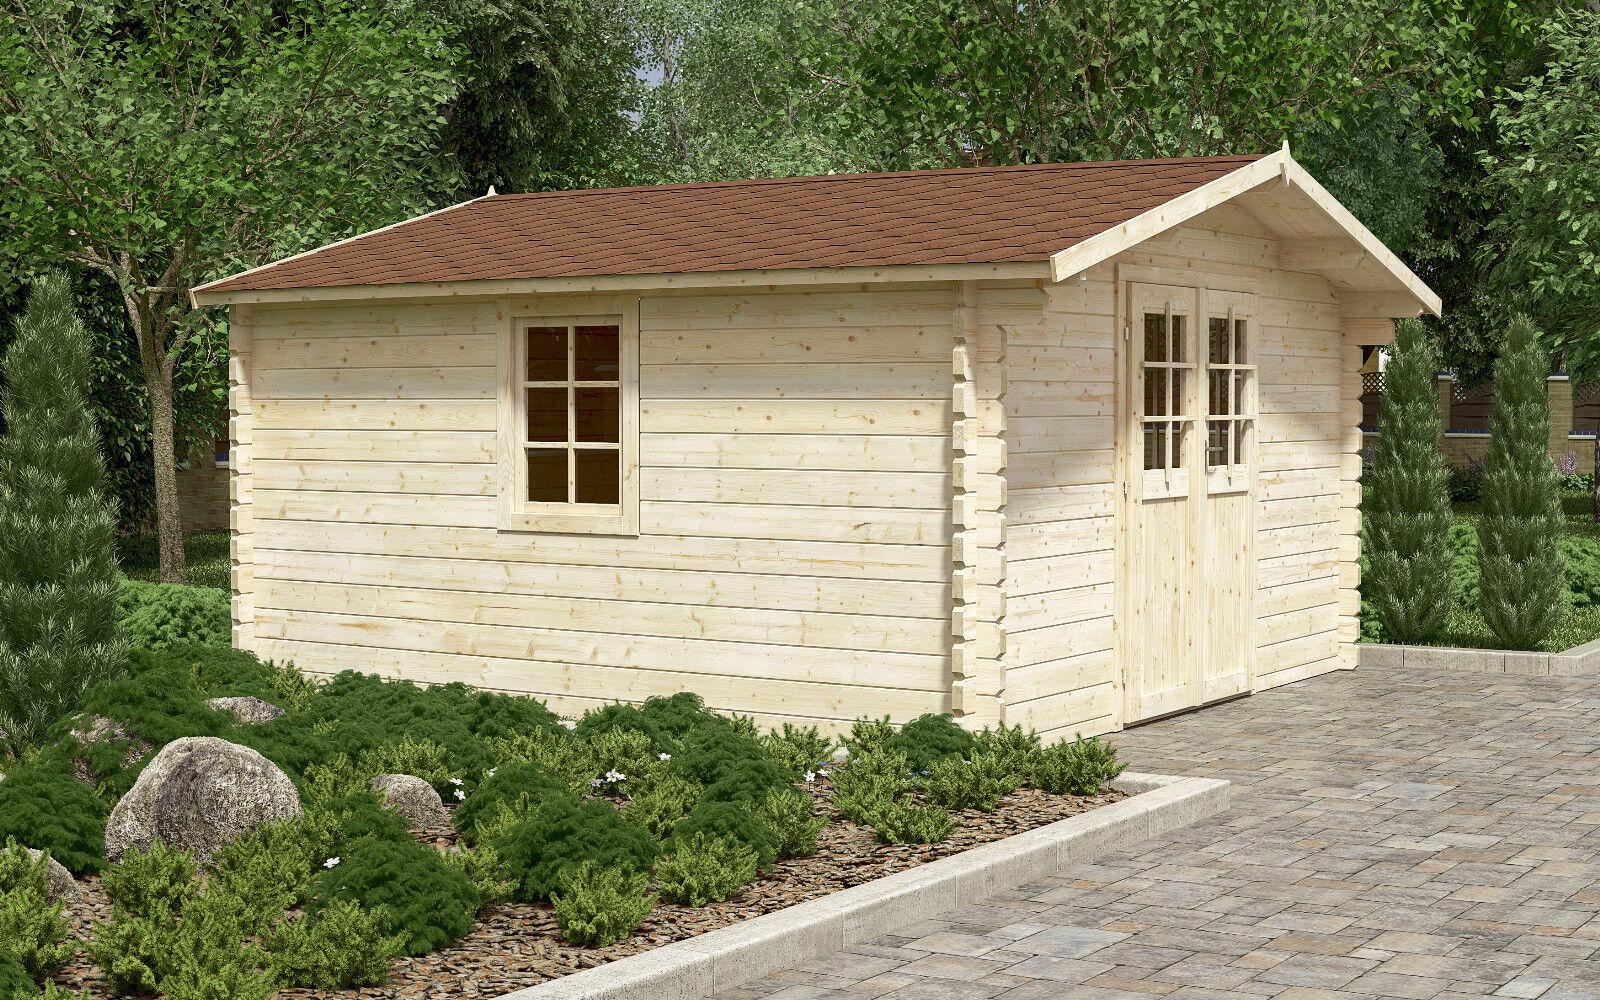 44 mm gartenhaus ca 400x400 cm ger tehaus blockhaus for Fenster 400x400